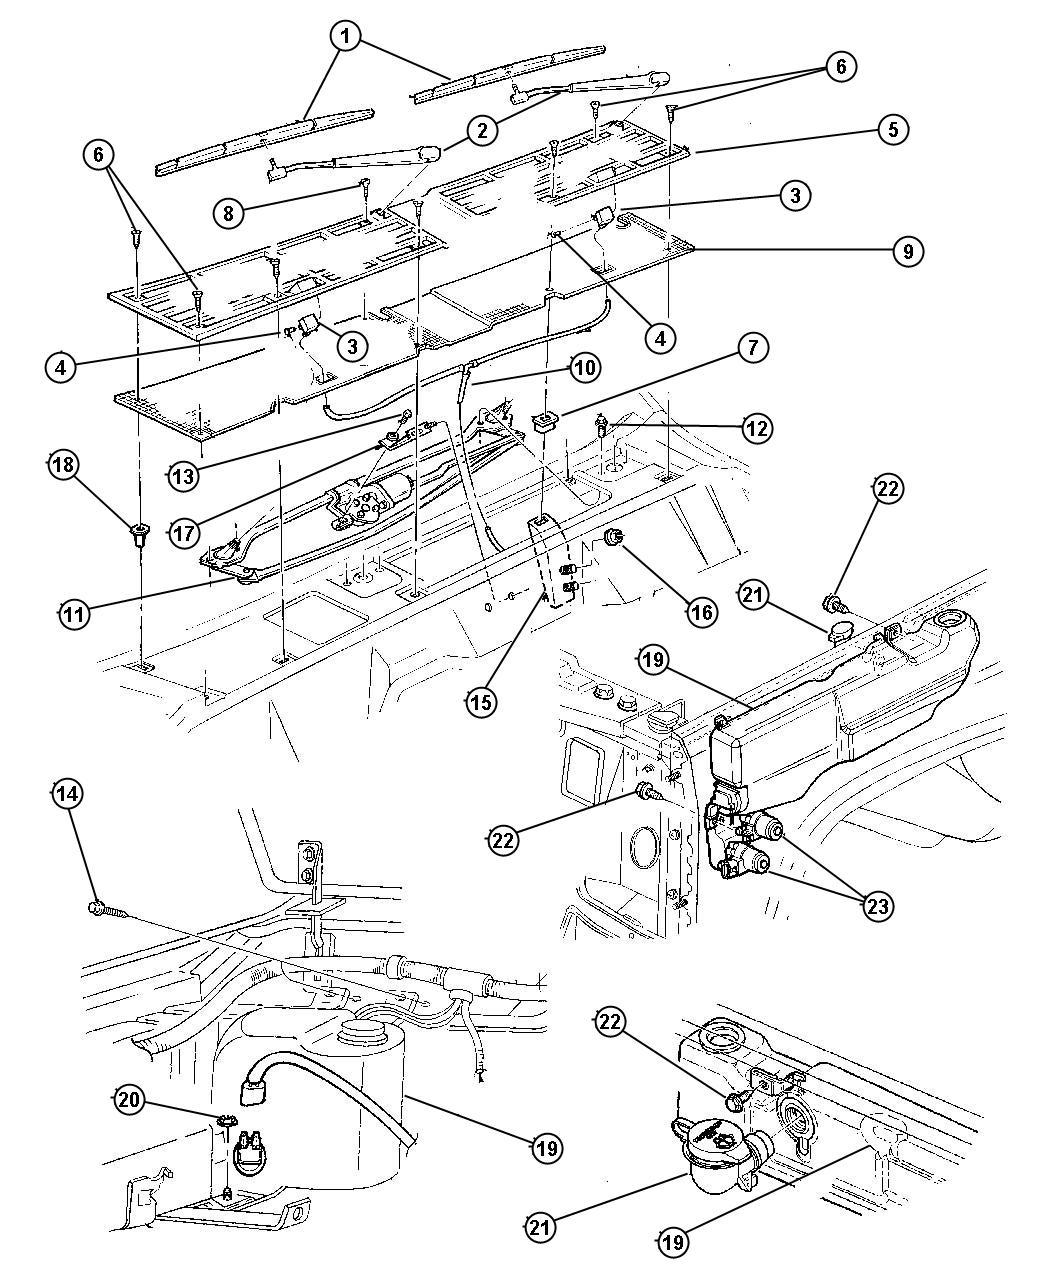 1998 Jeep Cherokee Windshield Wiper & Washer L.H.D.